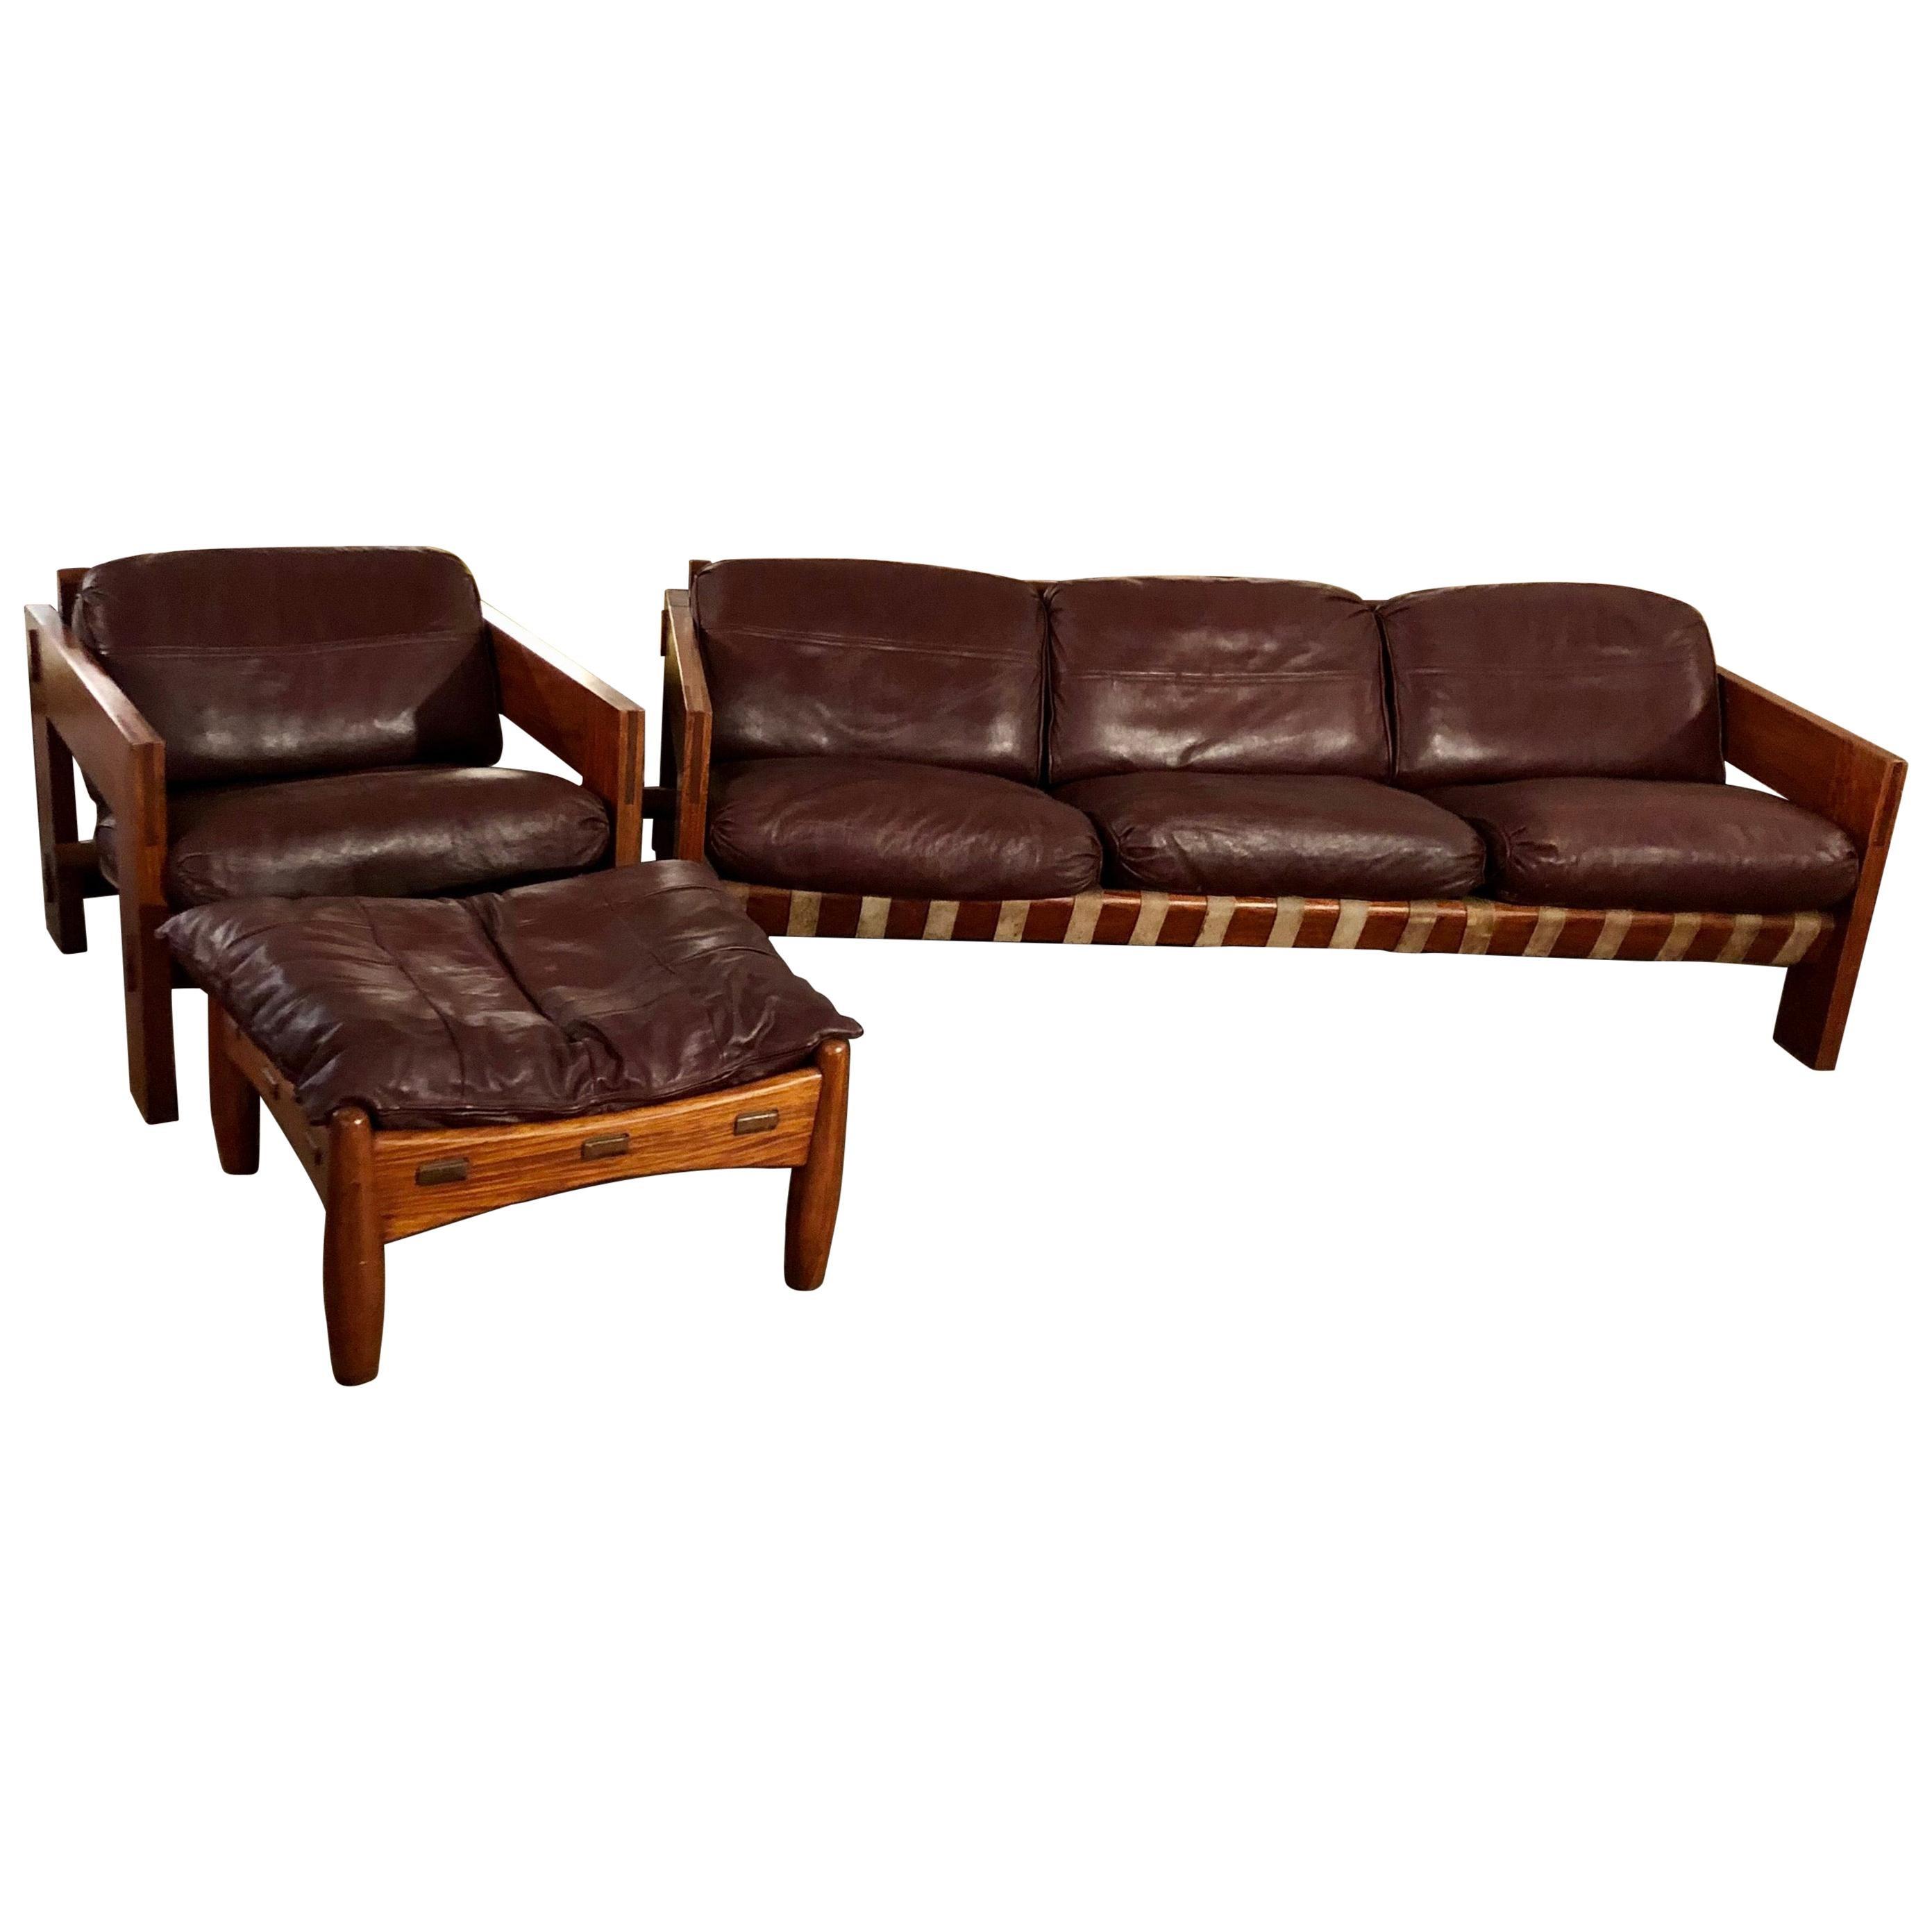 Vintage Rosewood/Leather Sofa & Armchair w/ Ottoman Set Attrib. Sergio Rodrigues